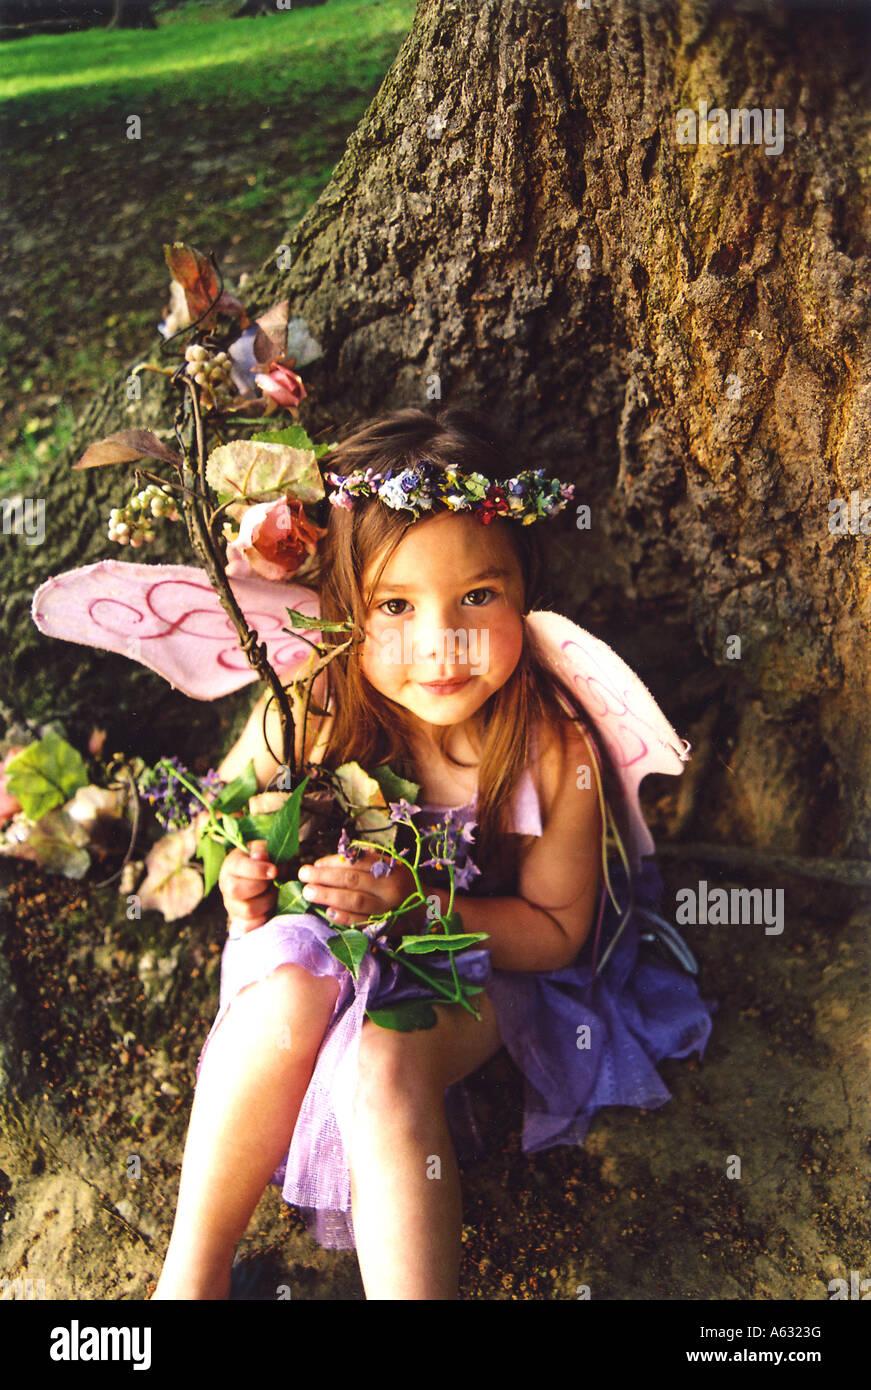 fairy child sitting under a tree pretty as the sugar plum fairy - Stock Image